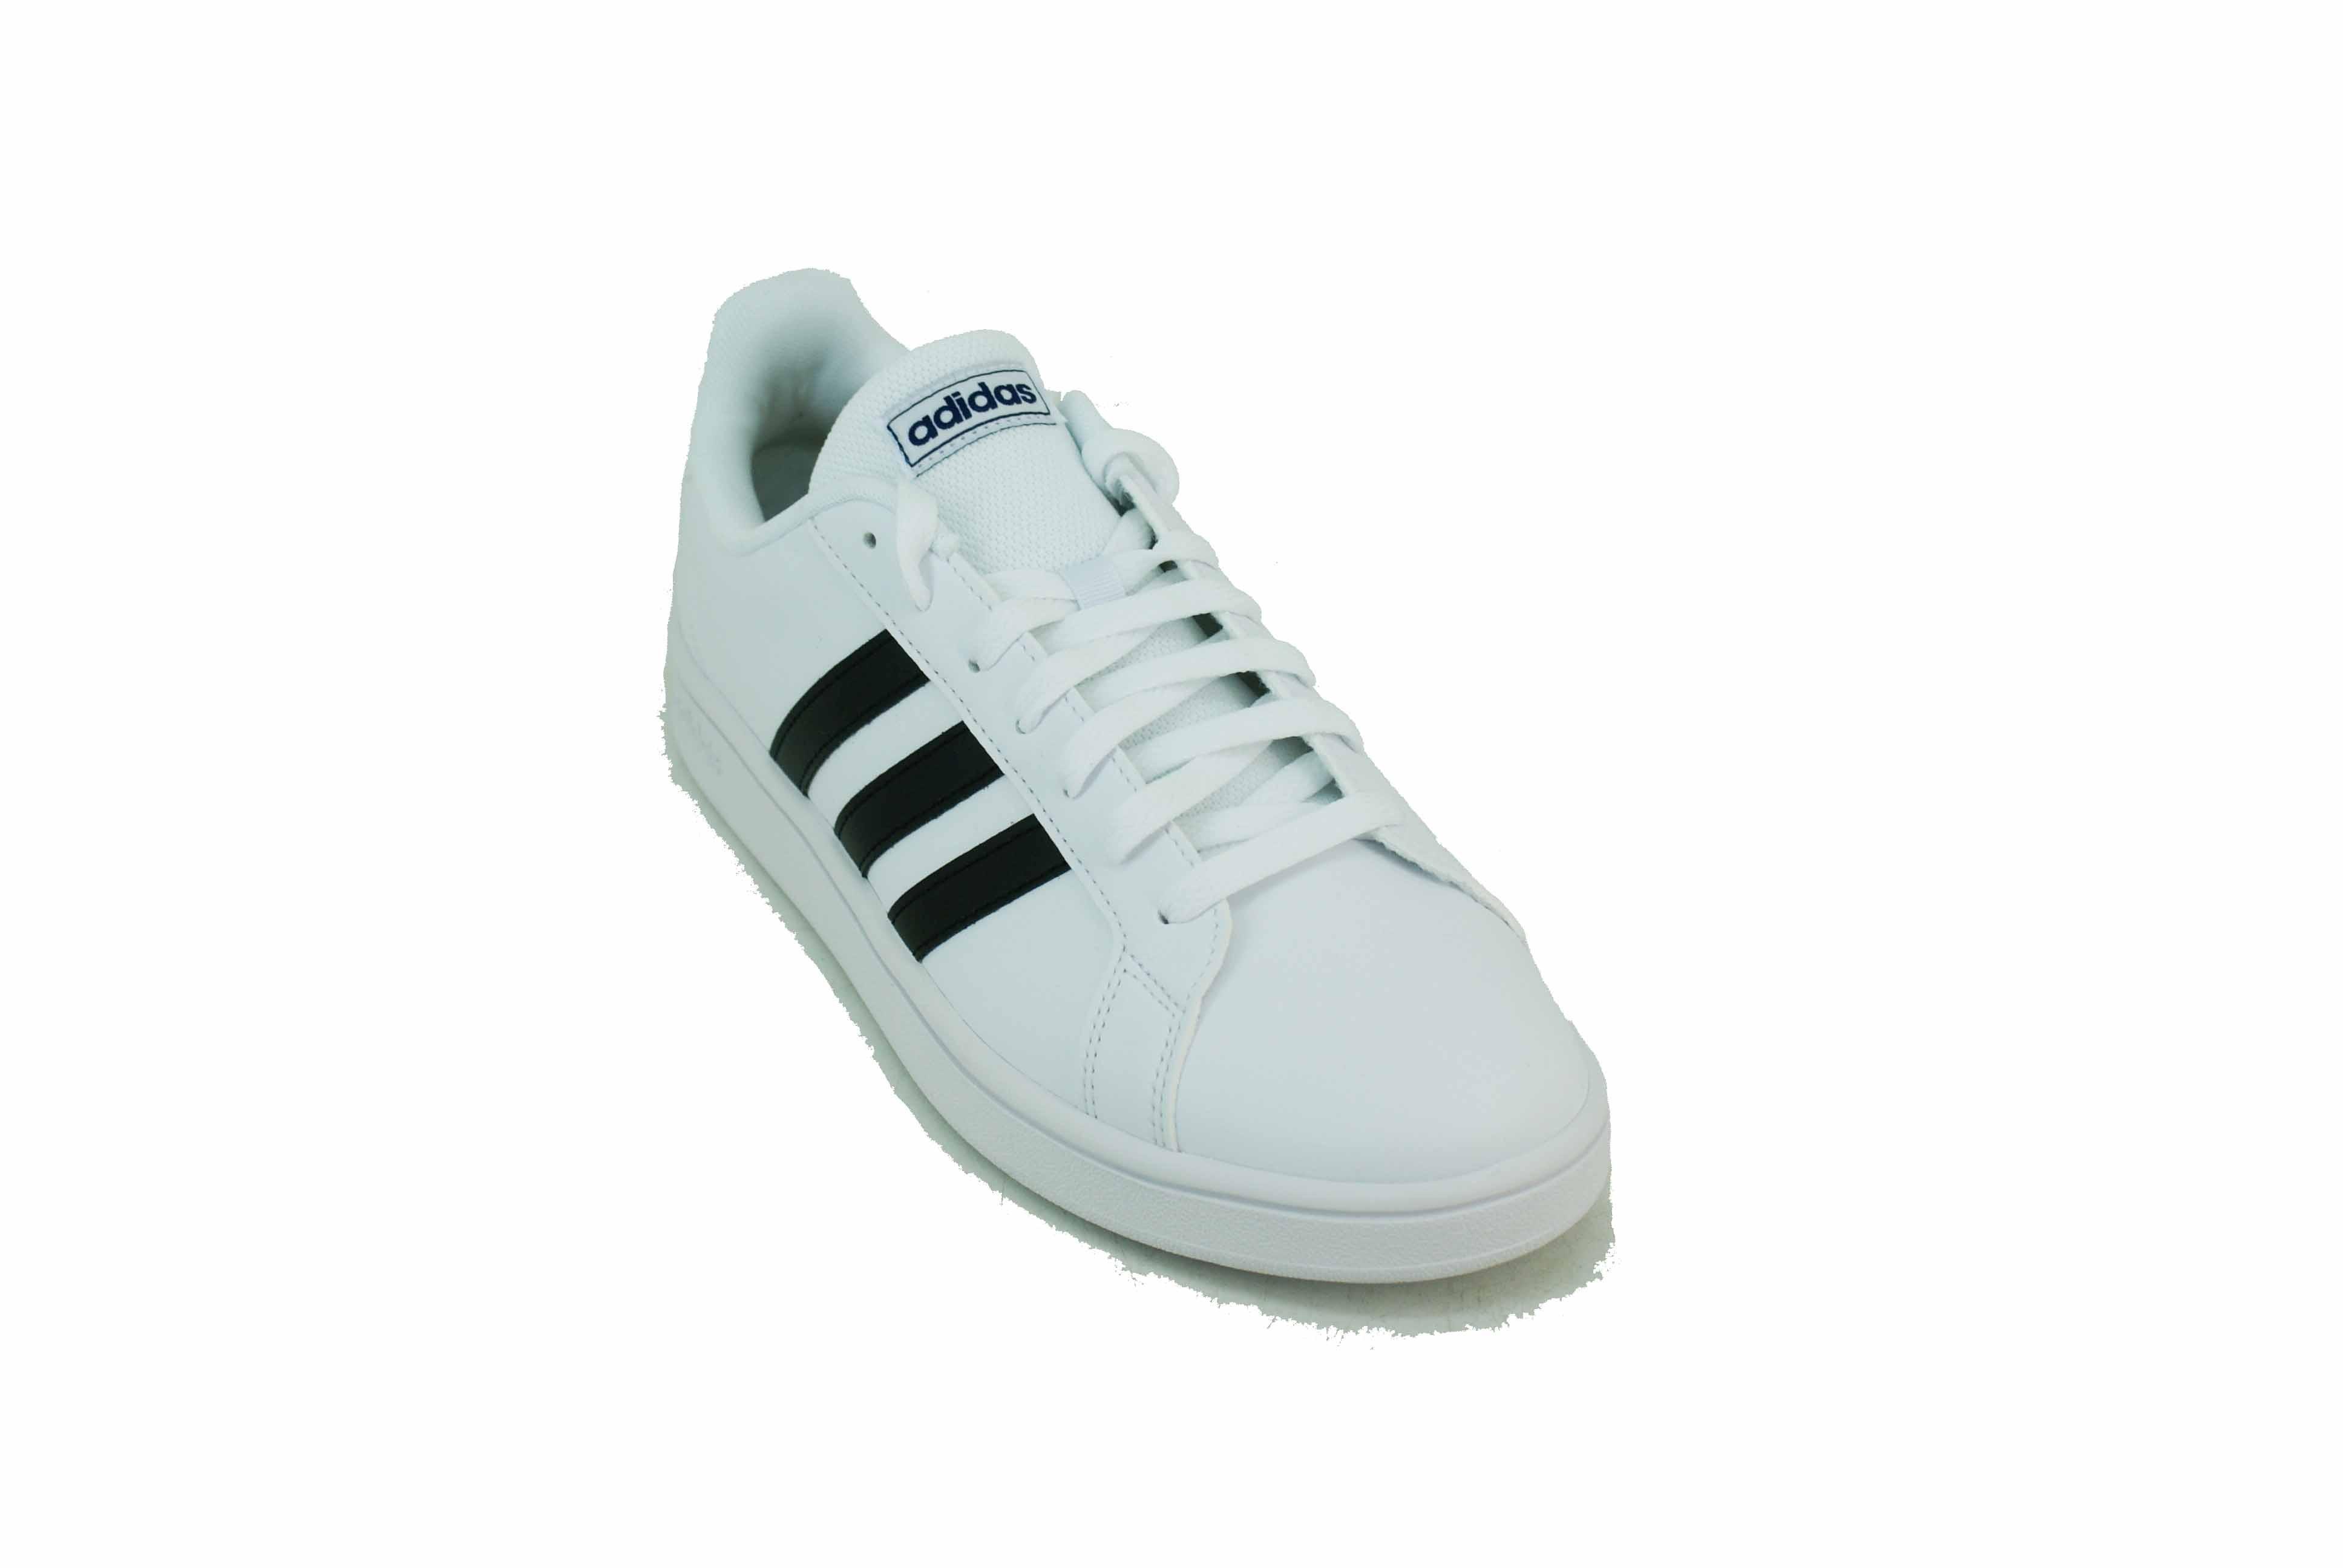 microondas Bisagra imagen  Zapatilla Adidas Grand Court Base Blanco/Negro Hombre Deporfan - Zapatillas  - E-Shop